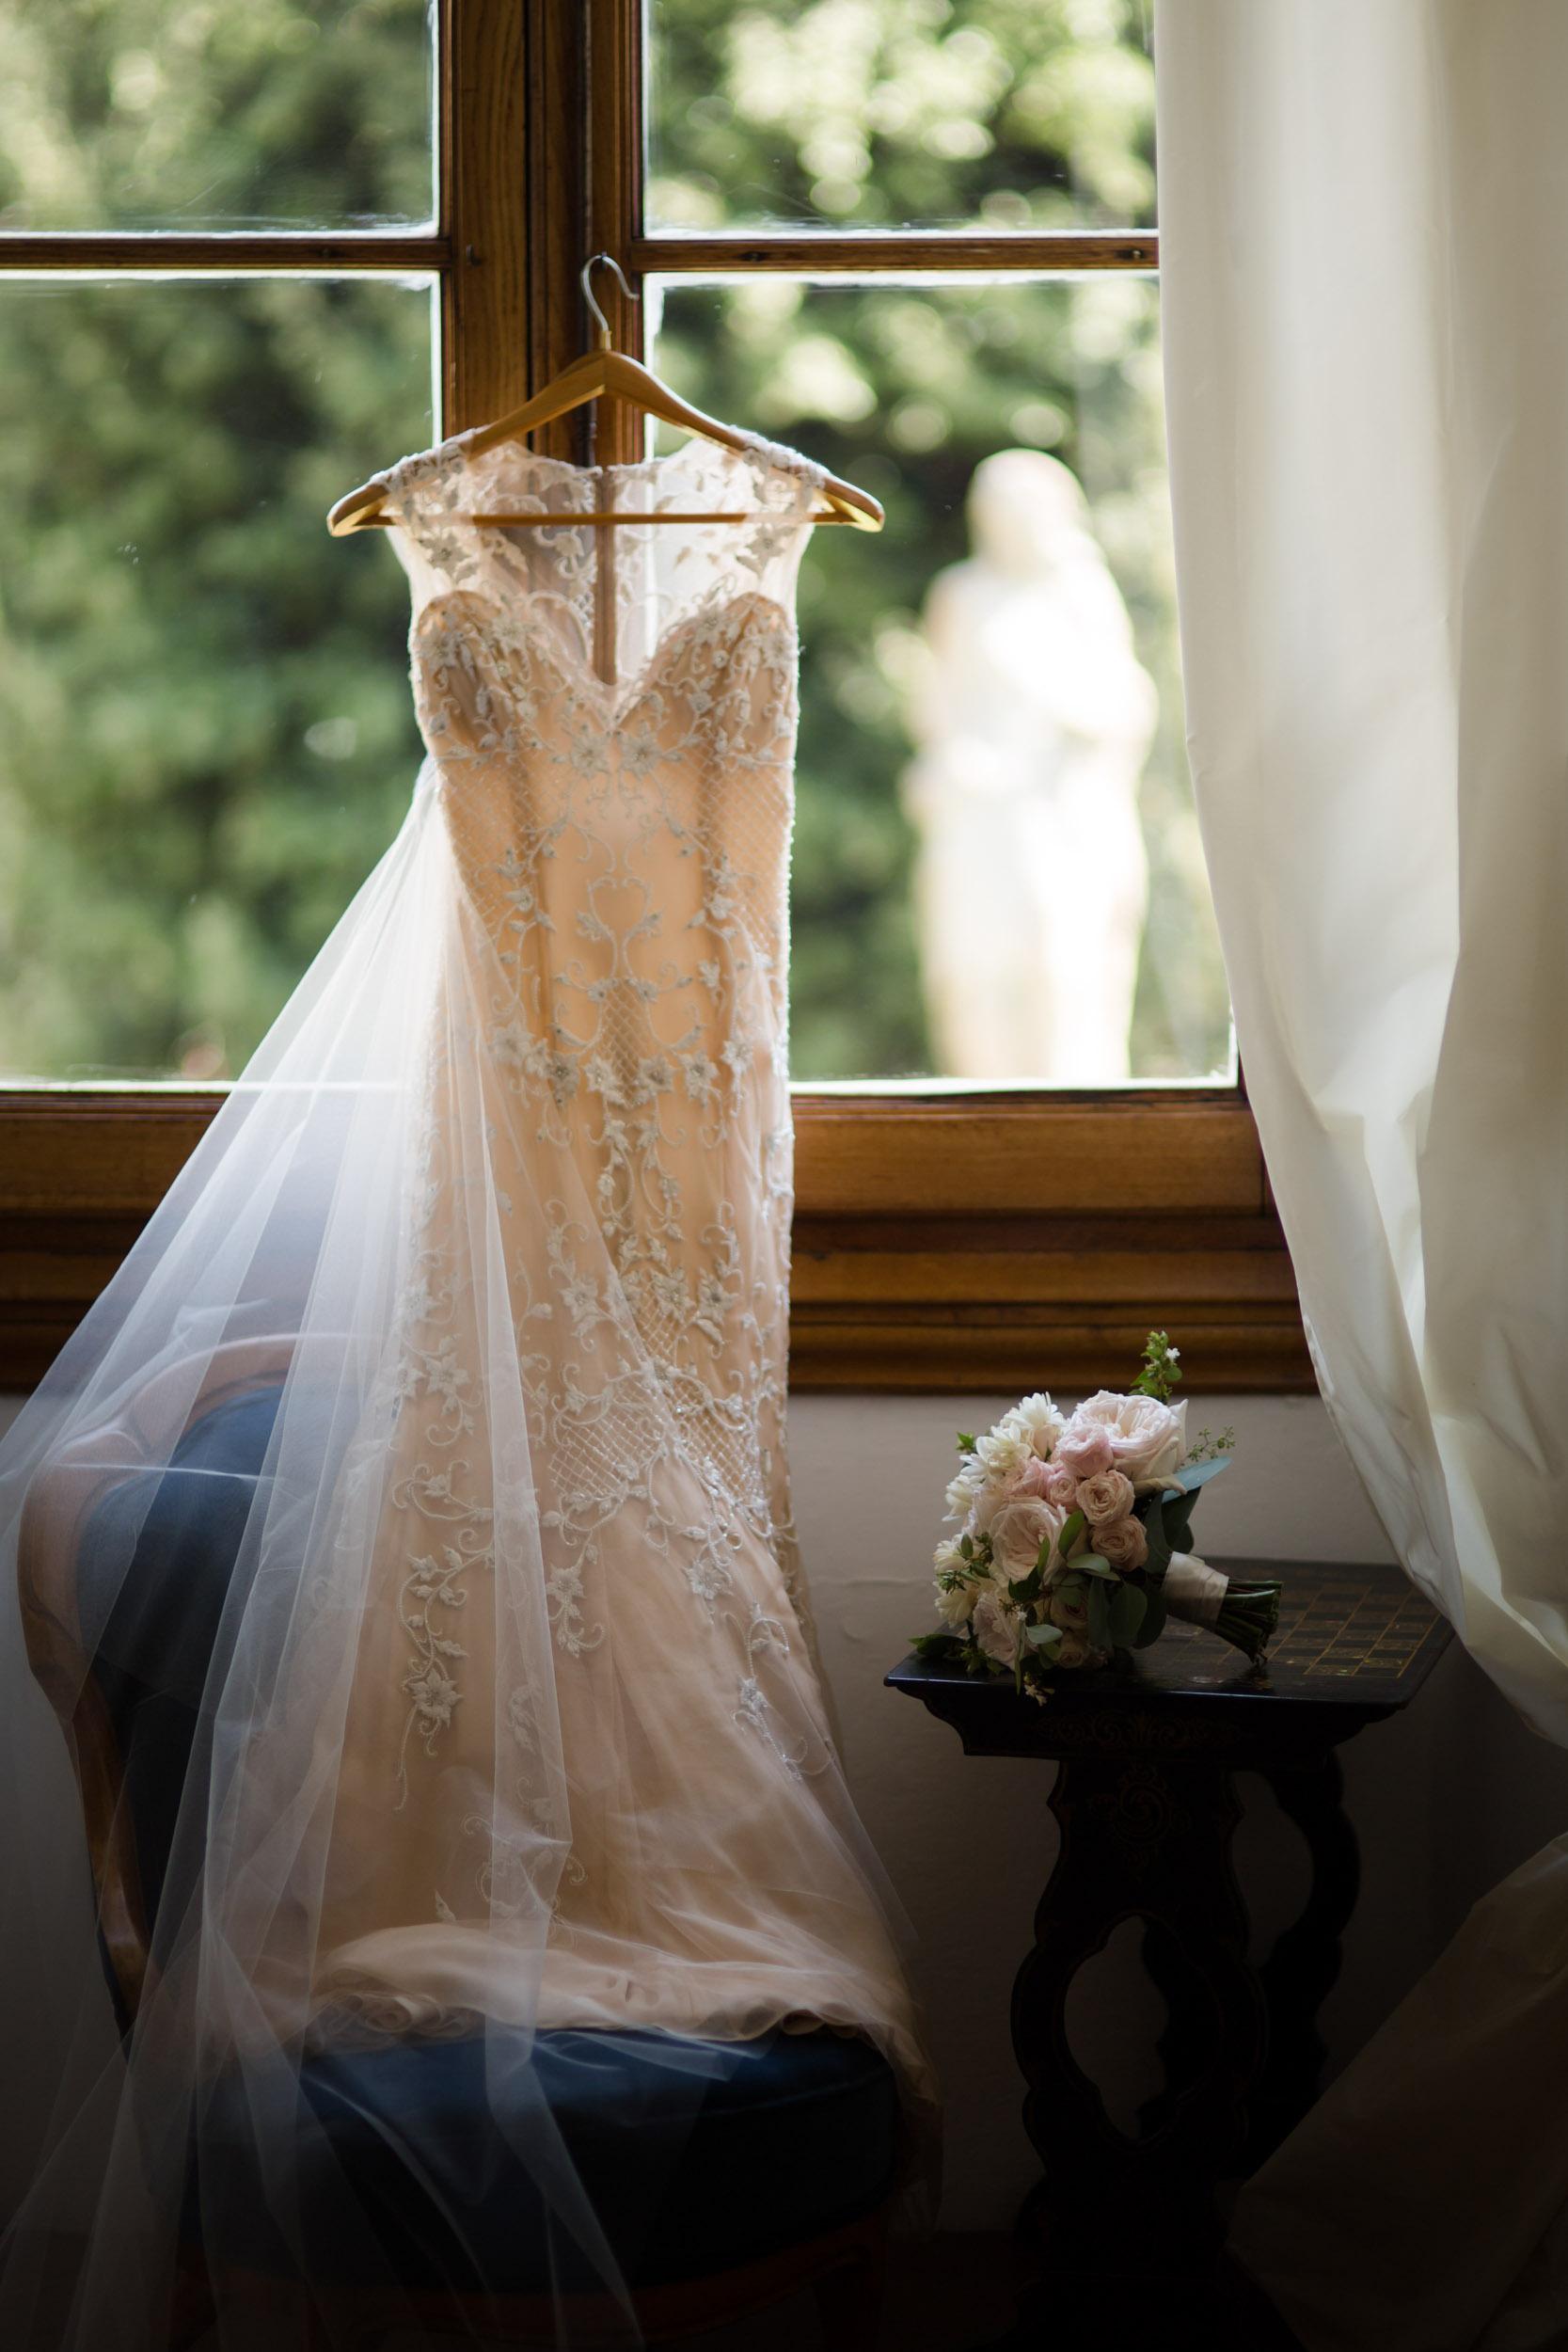 villa-gamberaia-florence-italy-destination-wedding-4.jpg